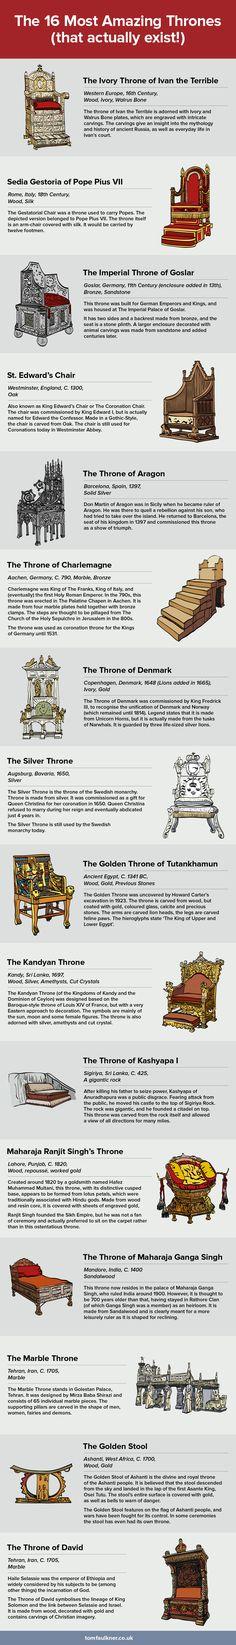 The 16 Most Amazing Thrones #Infographic #History #Thrones